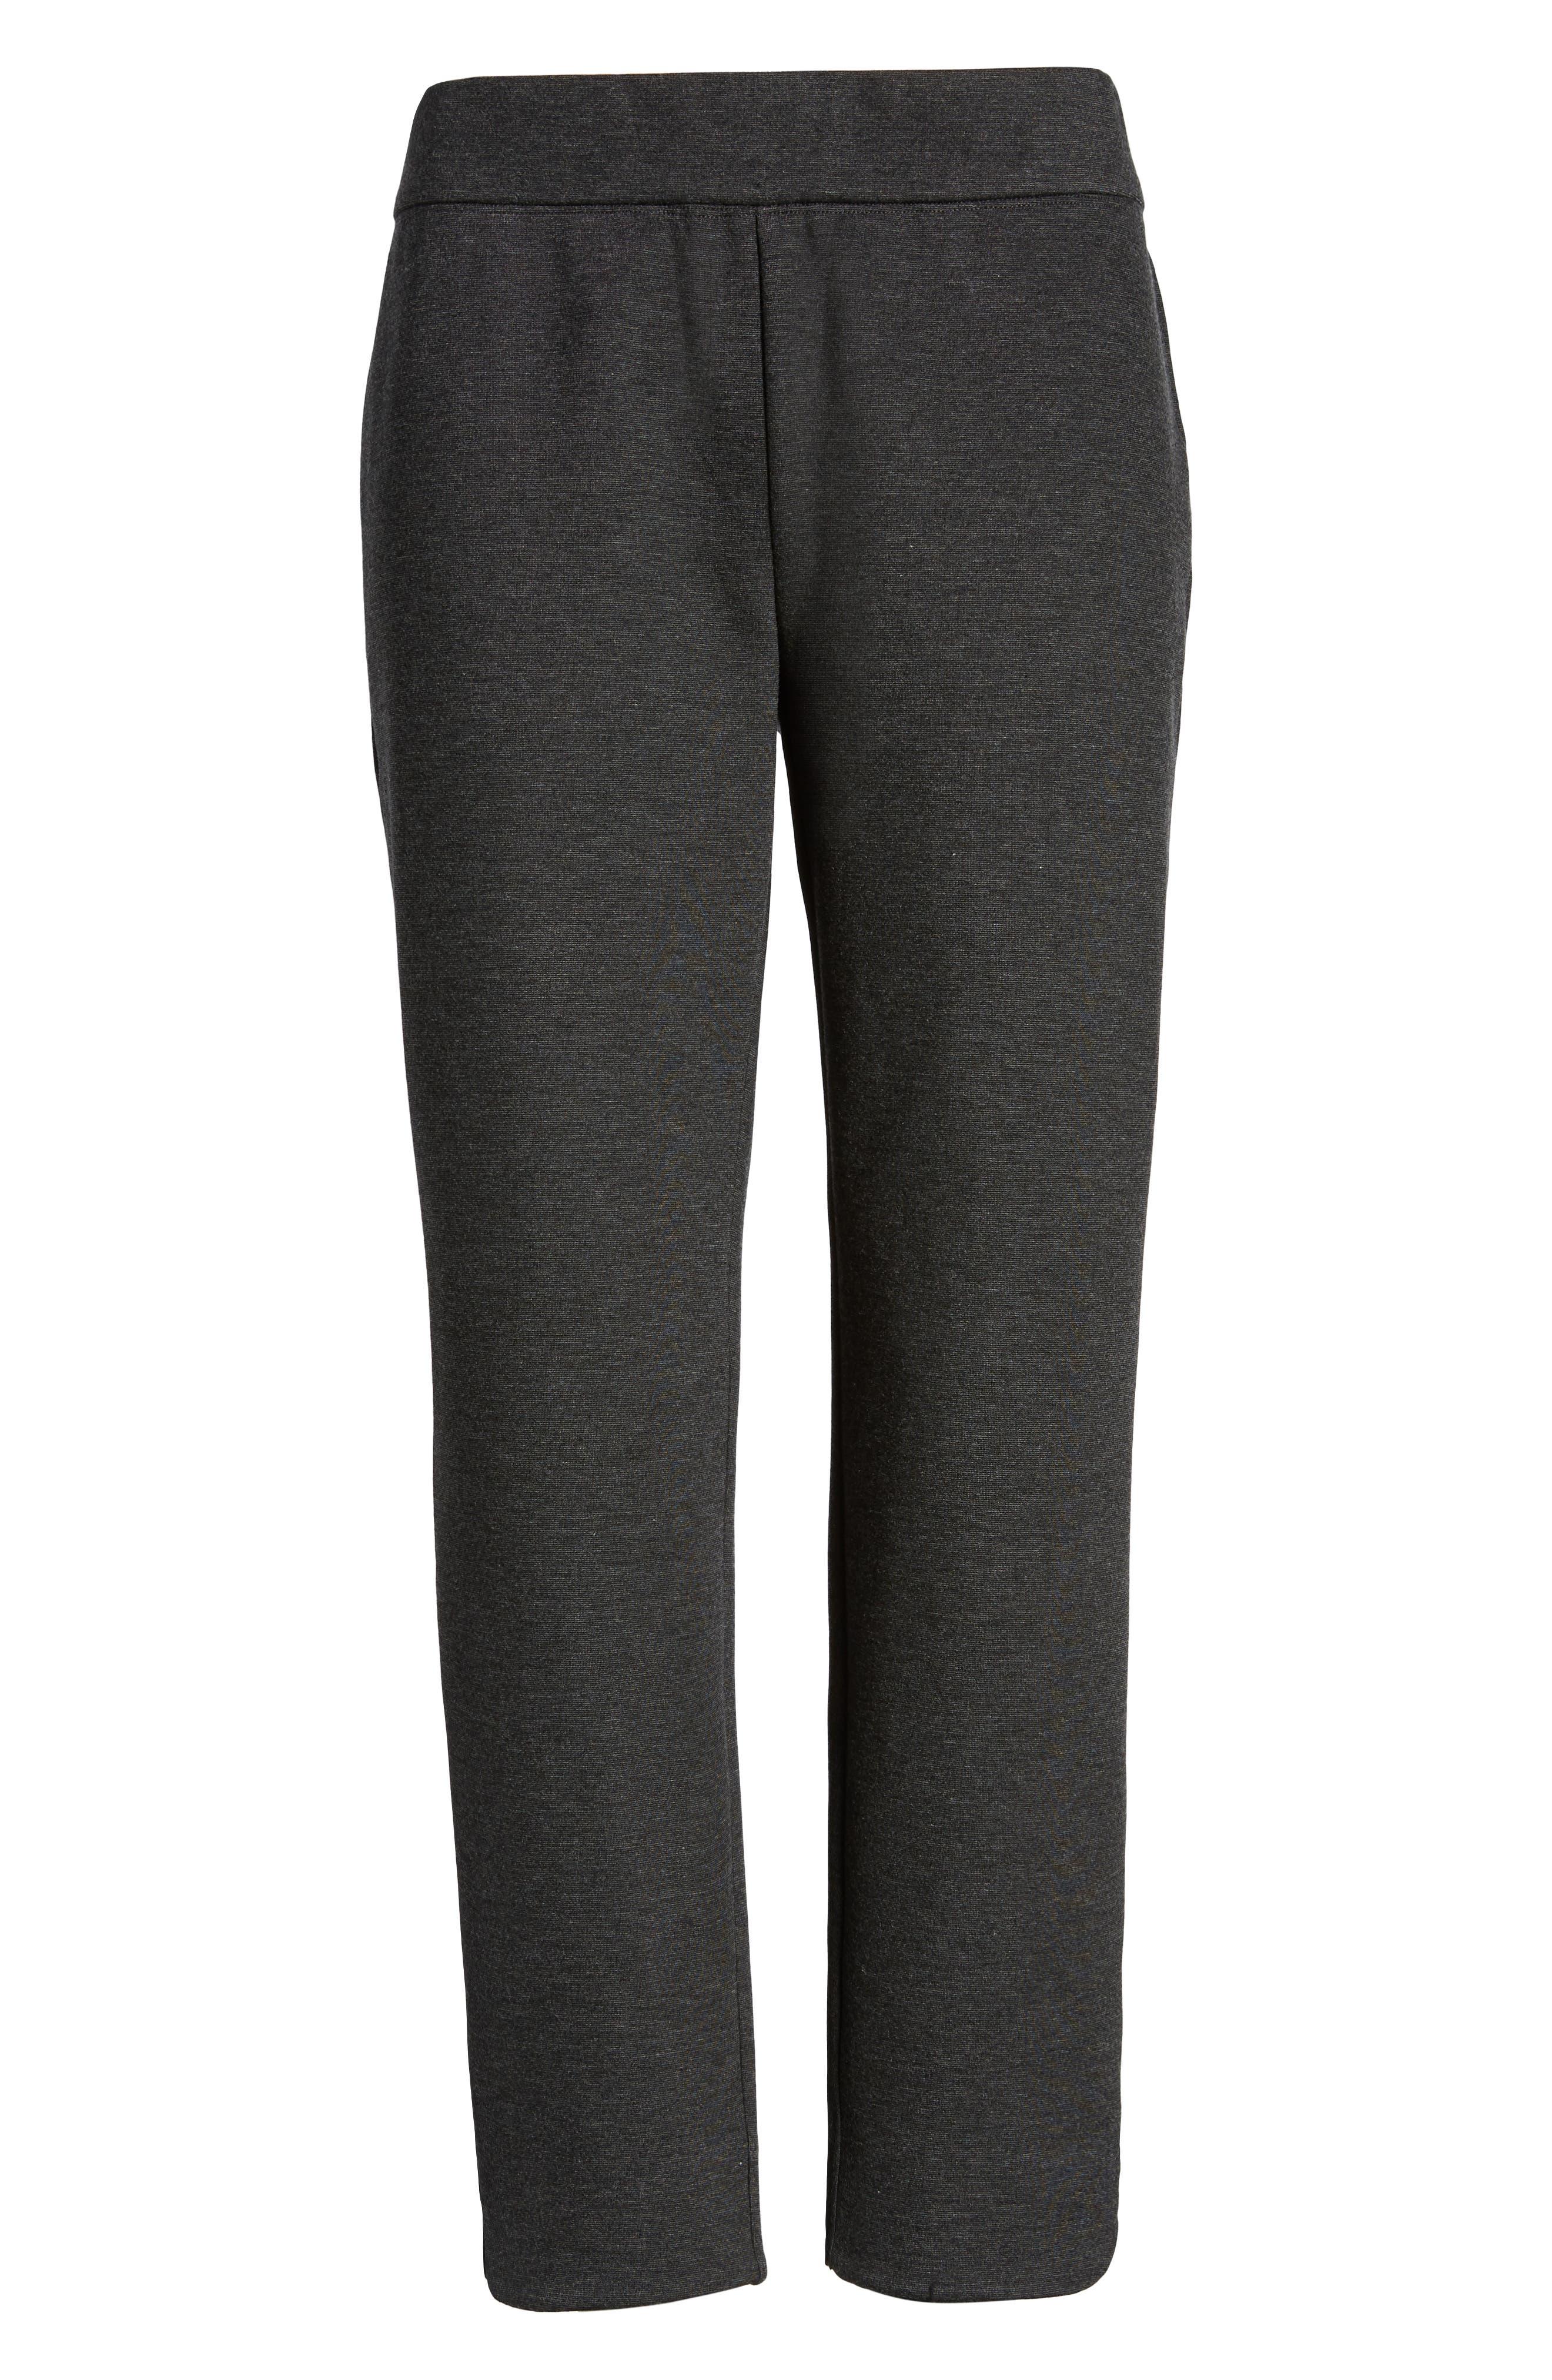 Slim Crop Pants,                             Alternate thumbnail 6, color,                             CHARCOAL